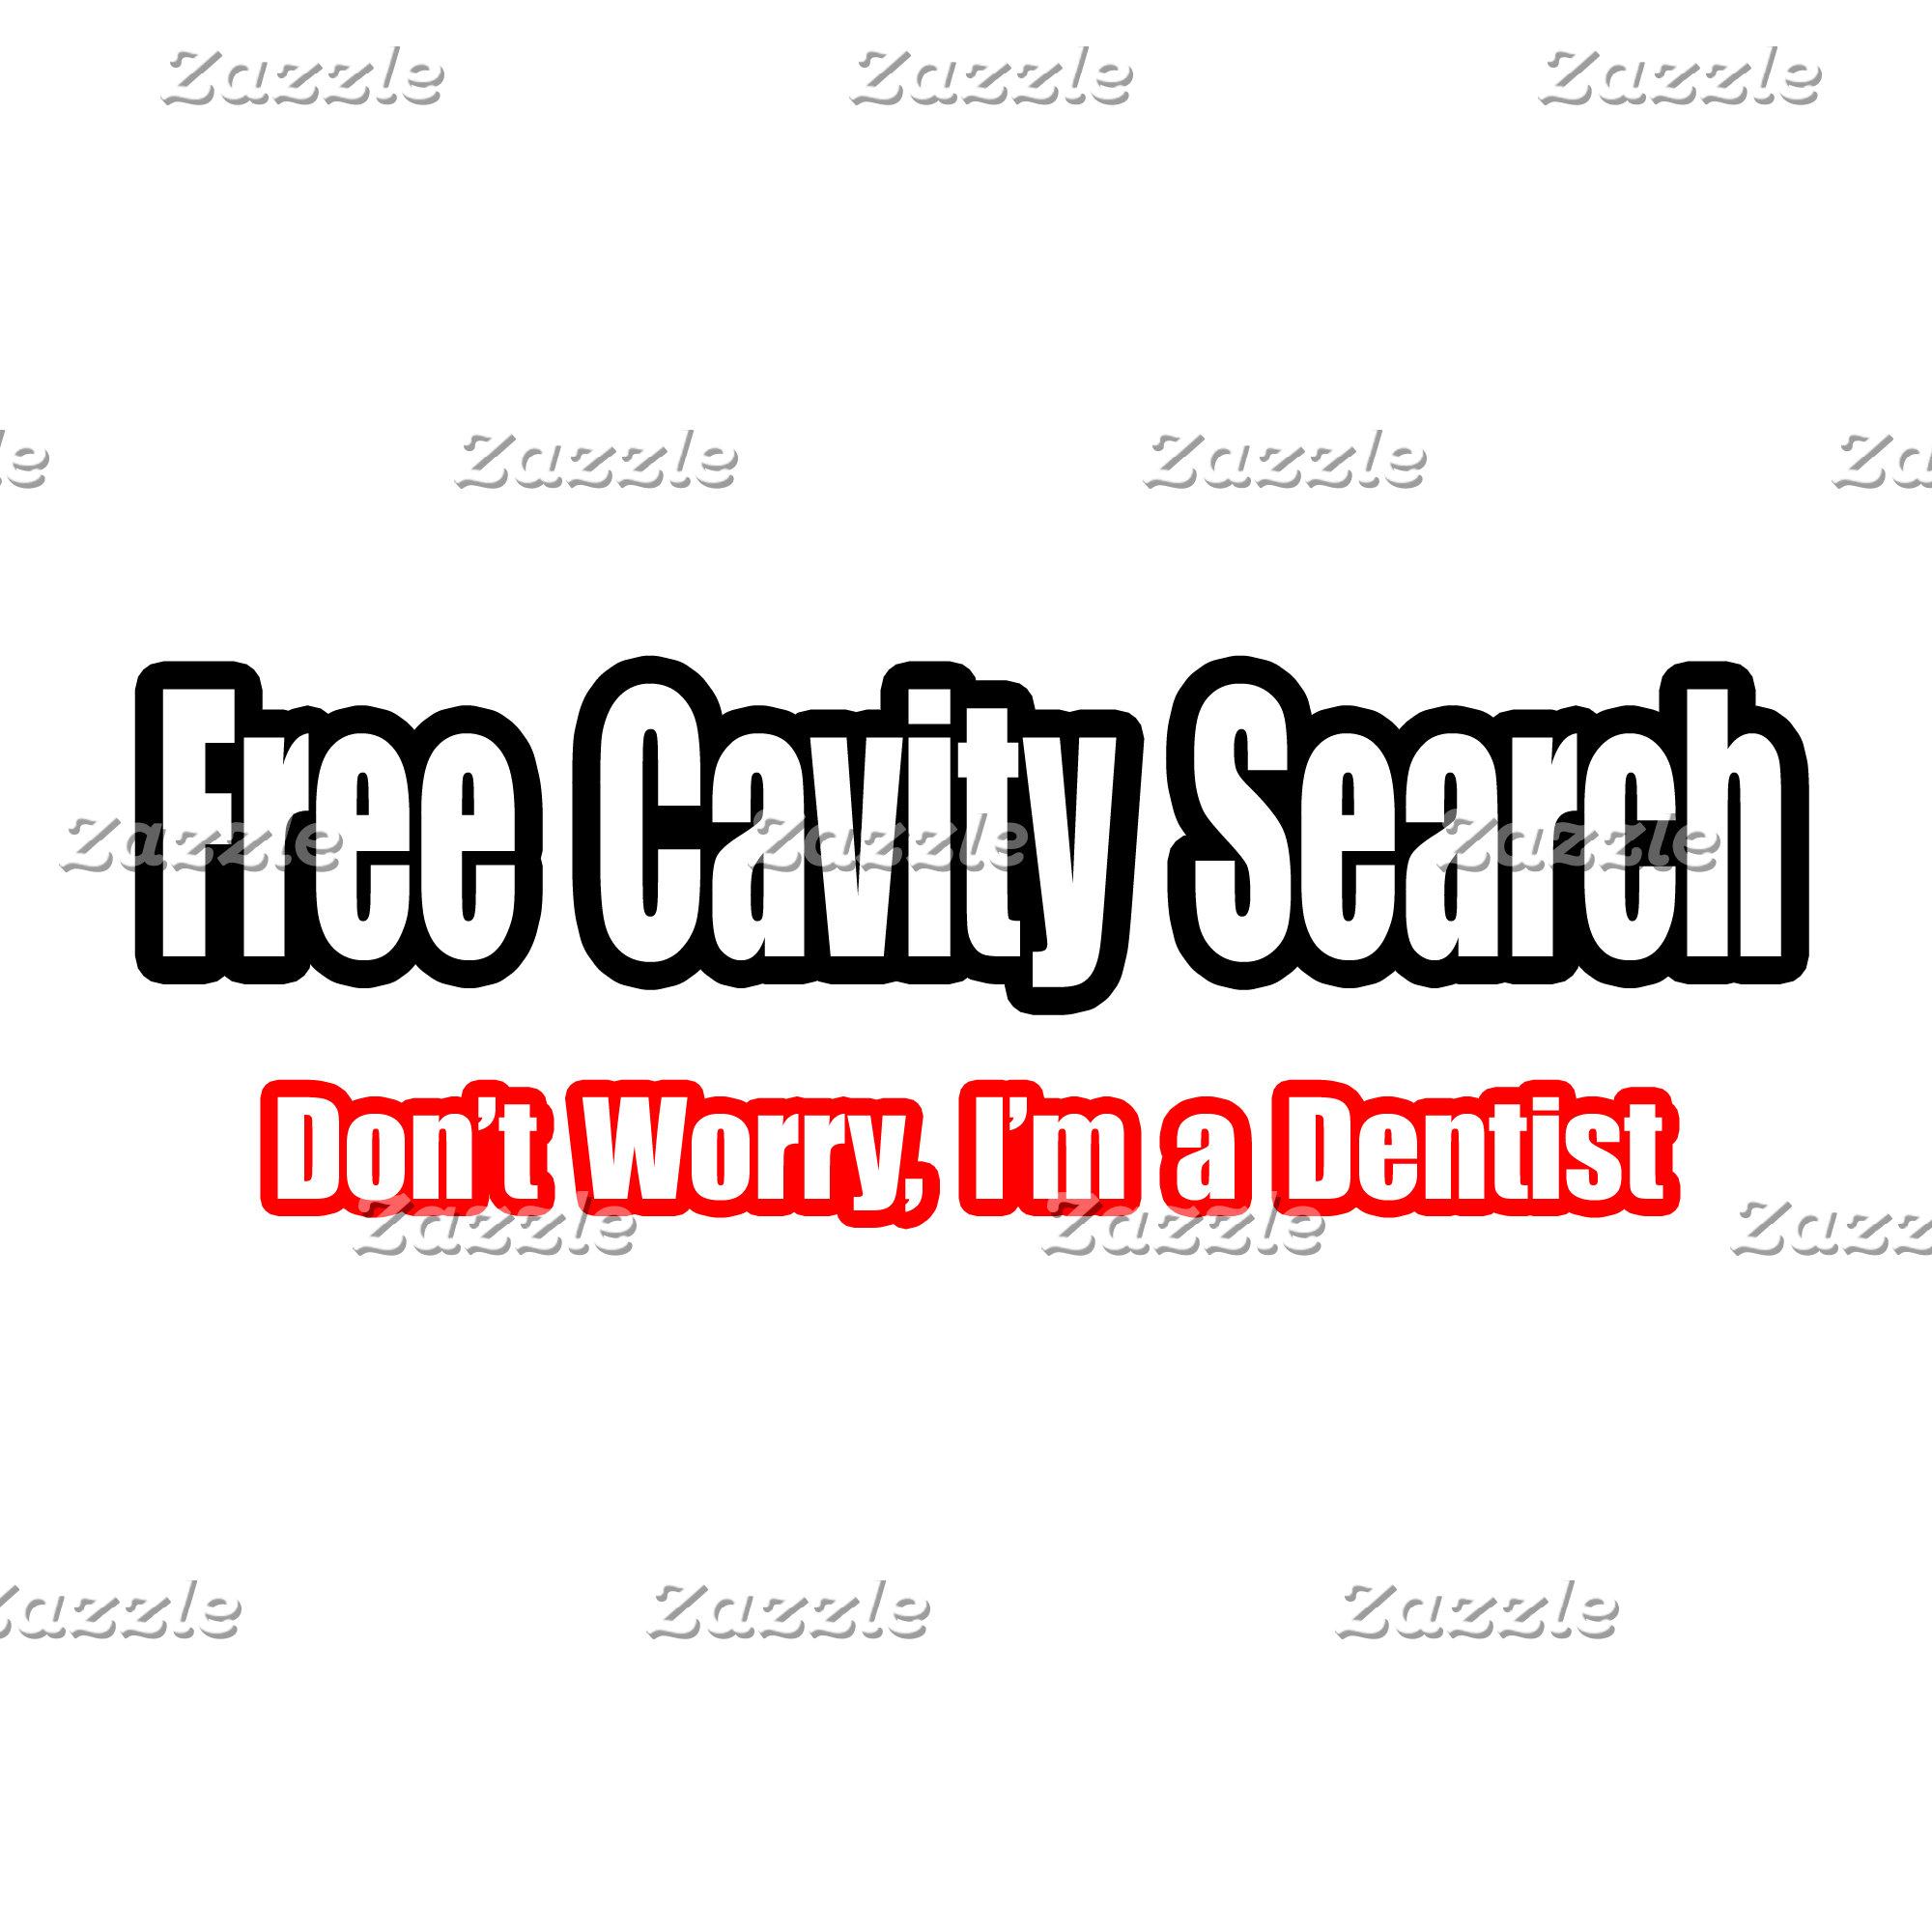 Free Cavity Search (Dentist Joke)